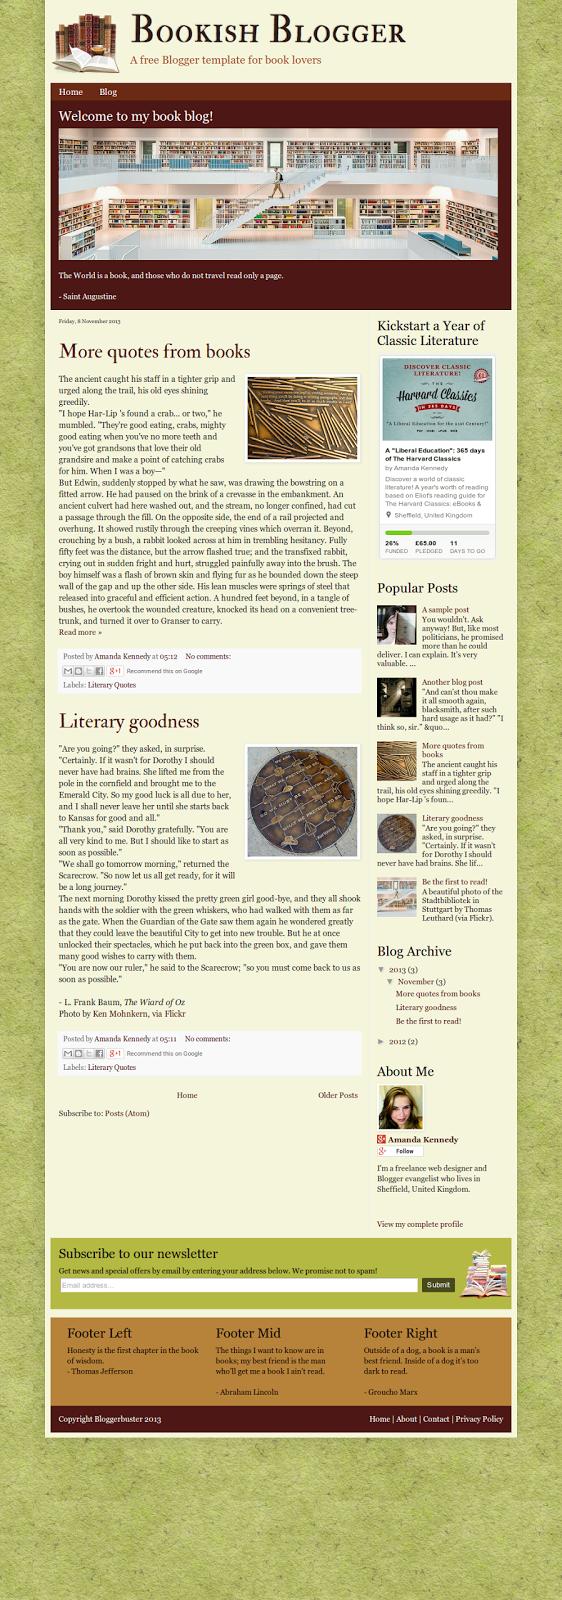 Blogger Book Template Images - Template Design Ideas